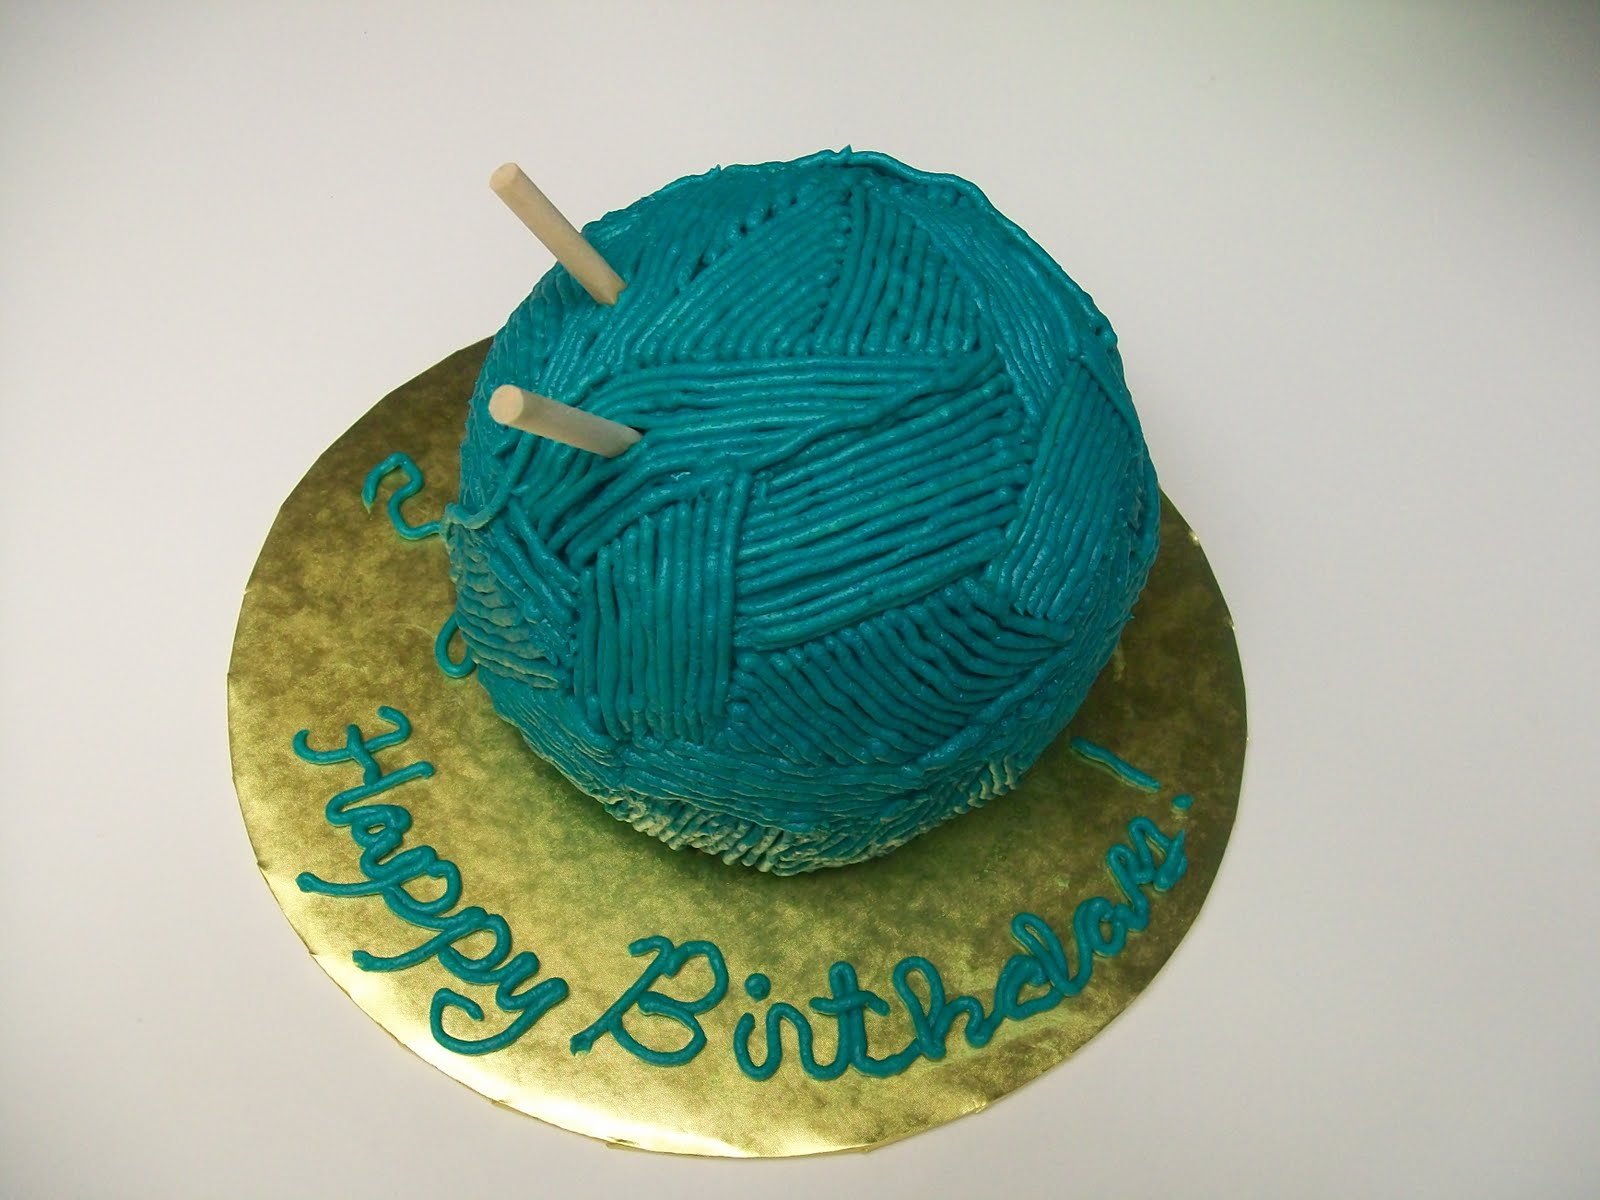 Grandmas Birthday Ball Of Yarn Cake